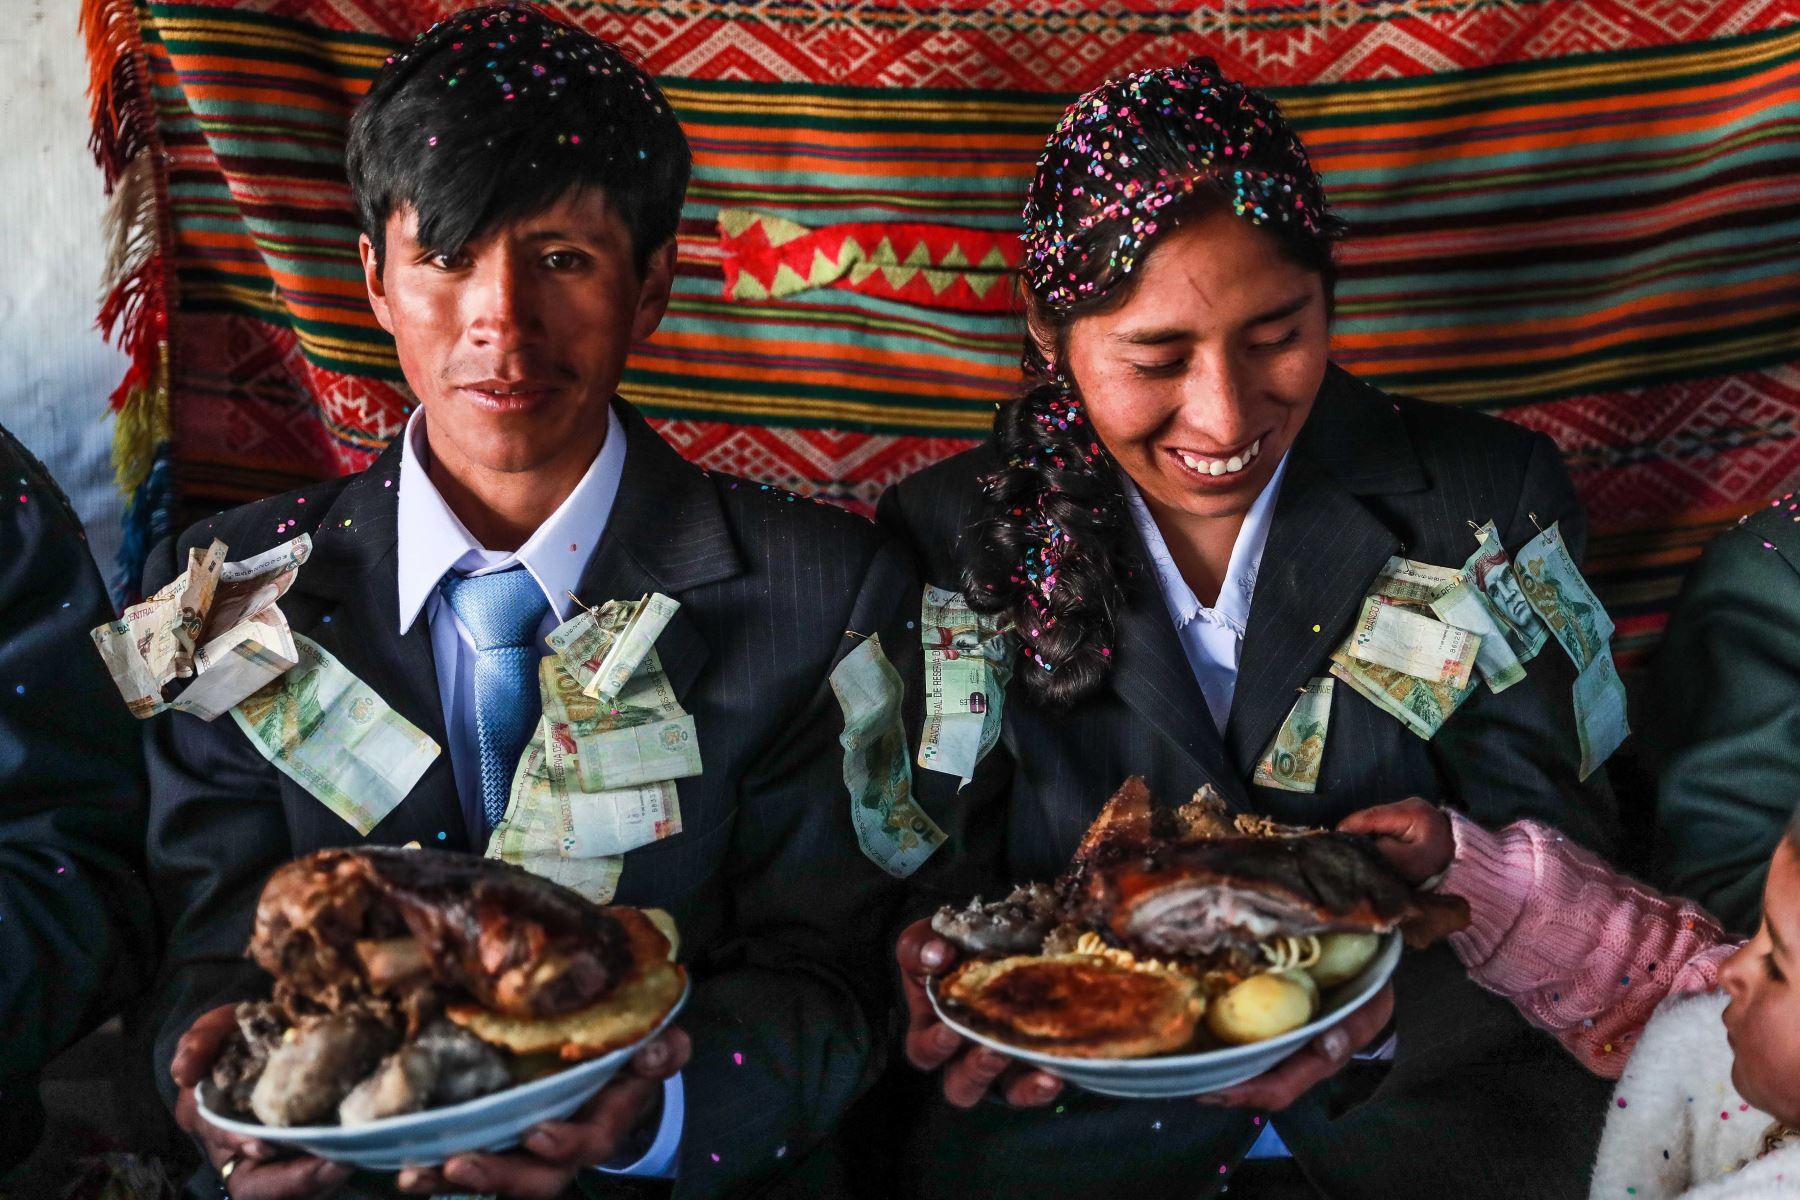 Kasarakuy, matrimonio en Huancarani, Cusco. Foto: ANDINA/Carlos Lezama